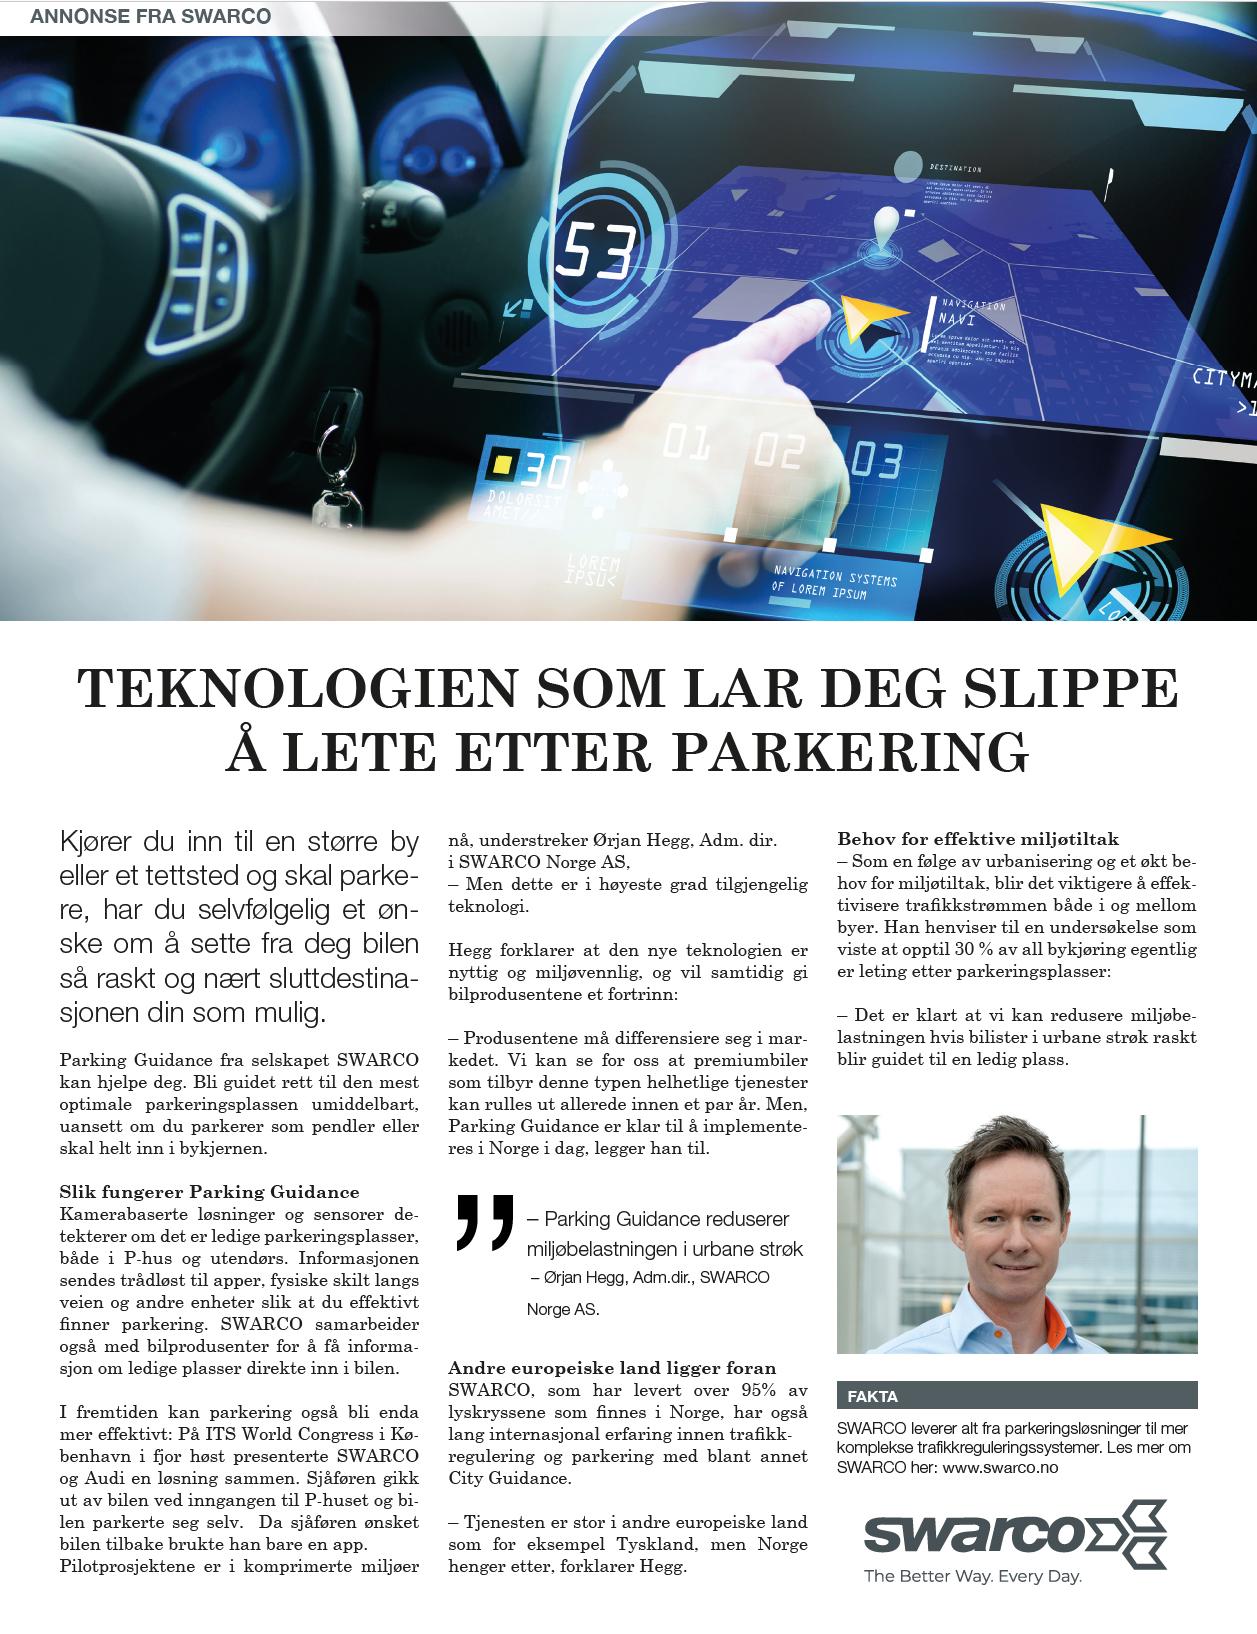 Content AD Teknisk Ukeblad SWARCO